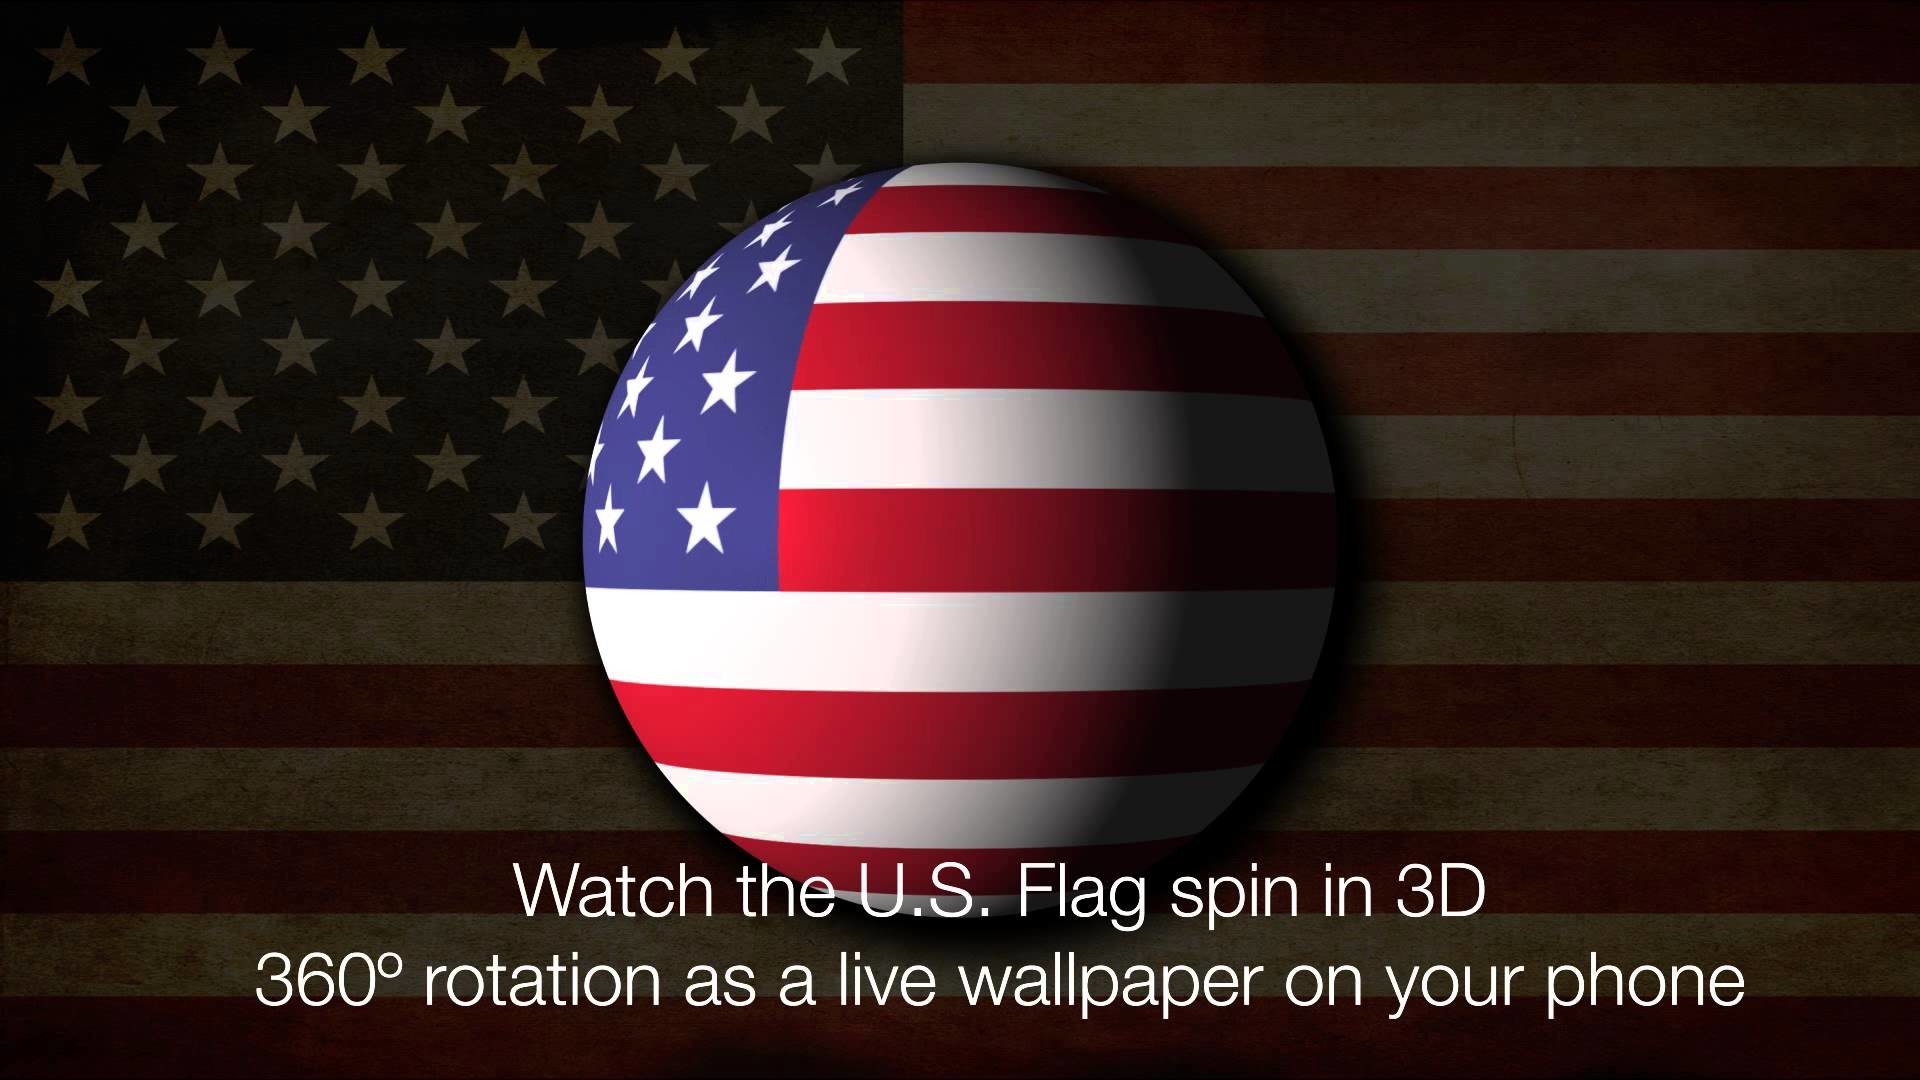 3D Spinning USA Flag Live Wallpaper